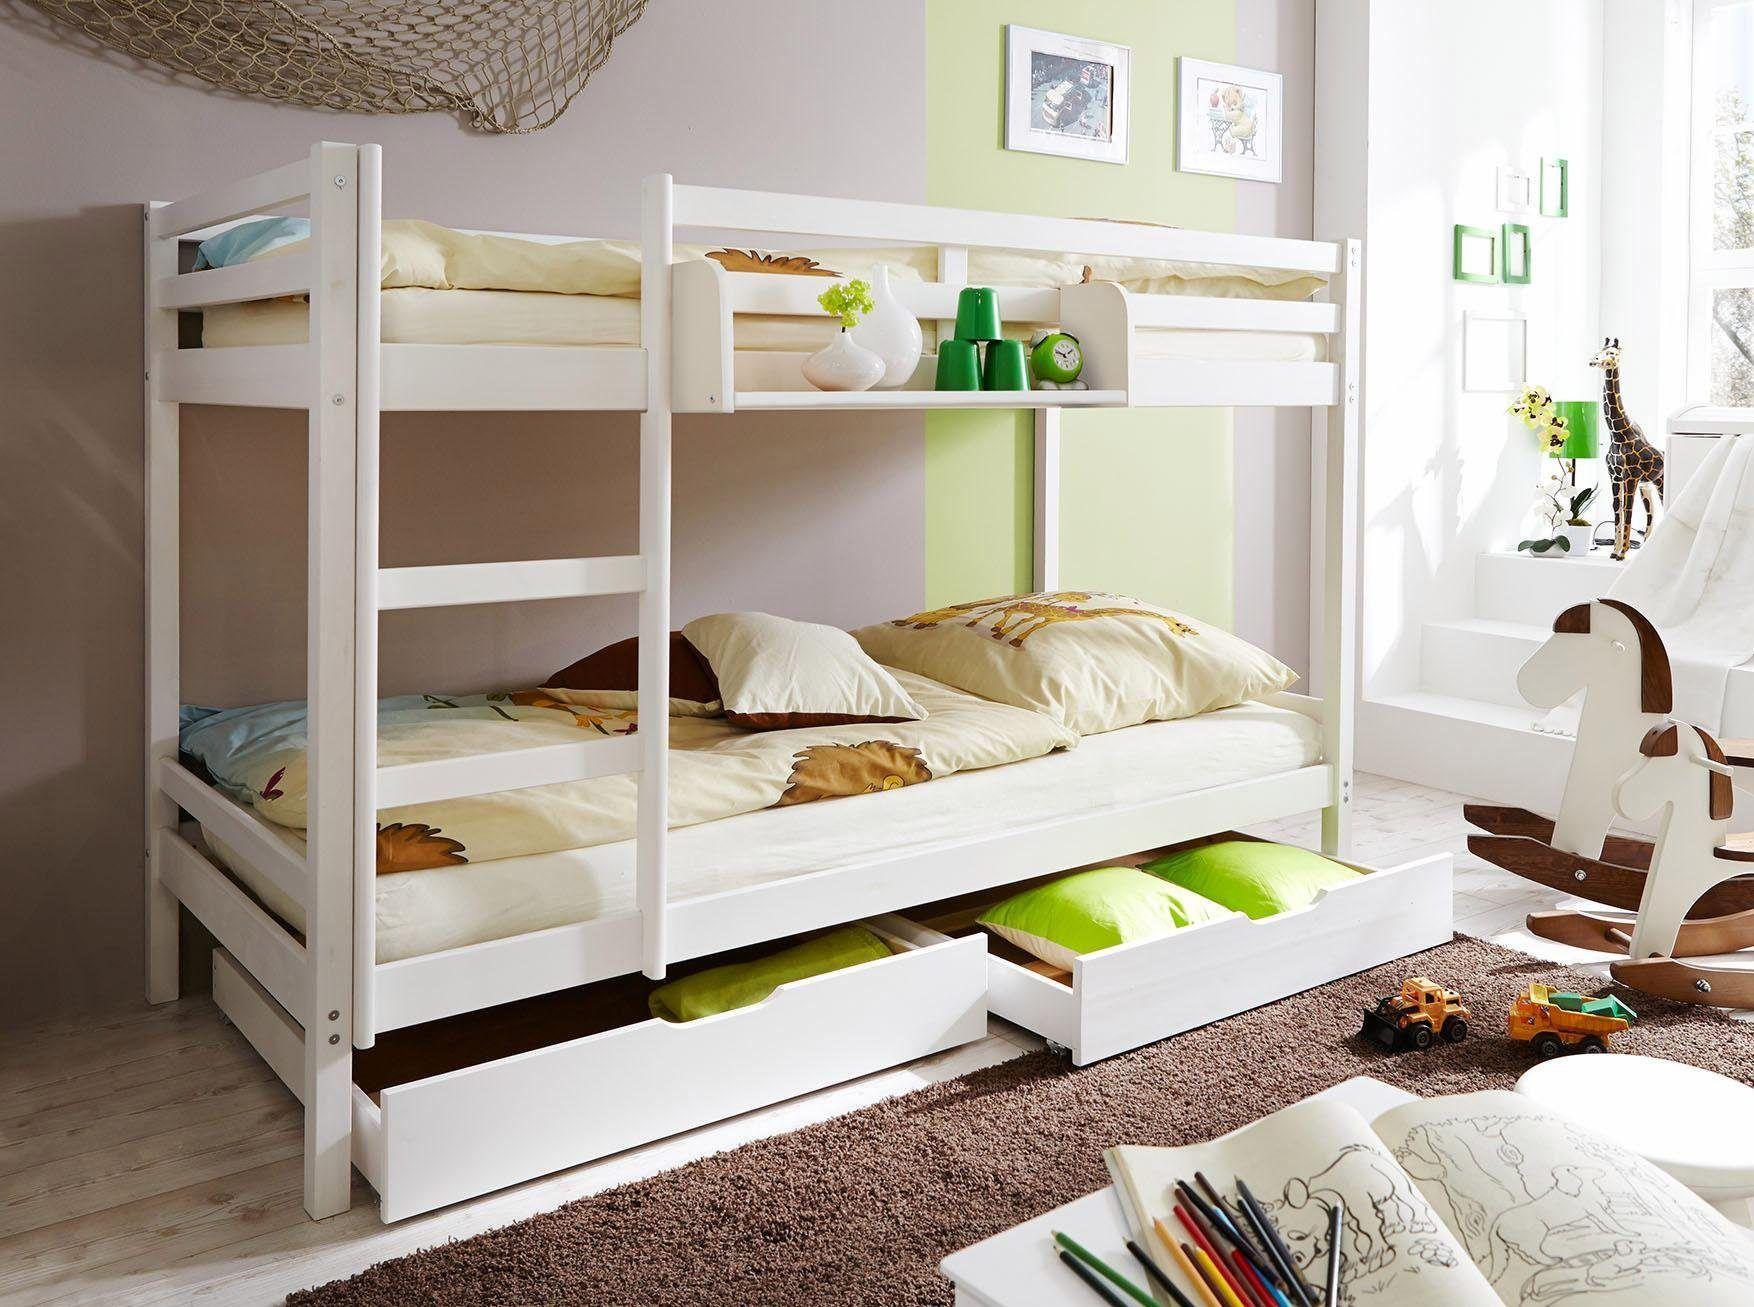 ticaa etagenbett rene kiefer jetzt bestellen unter - Coolste Etagenbetten